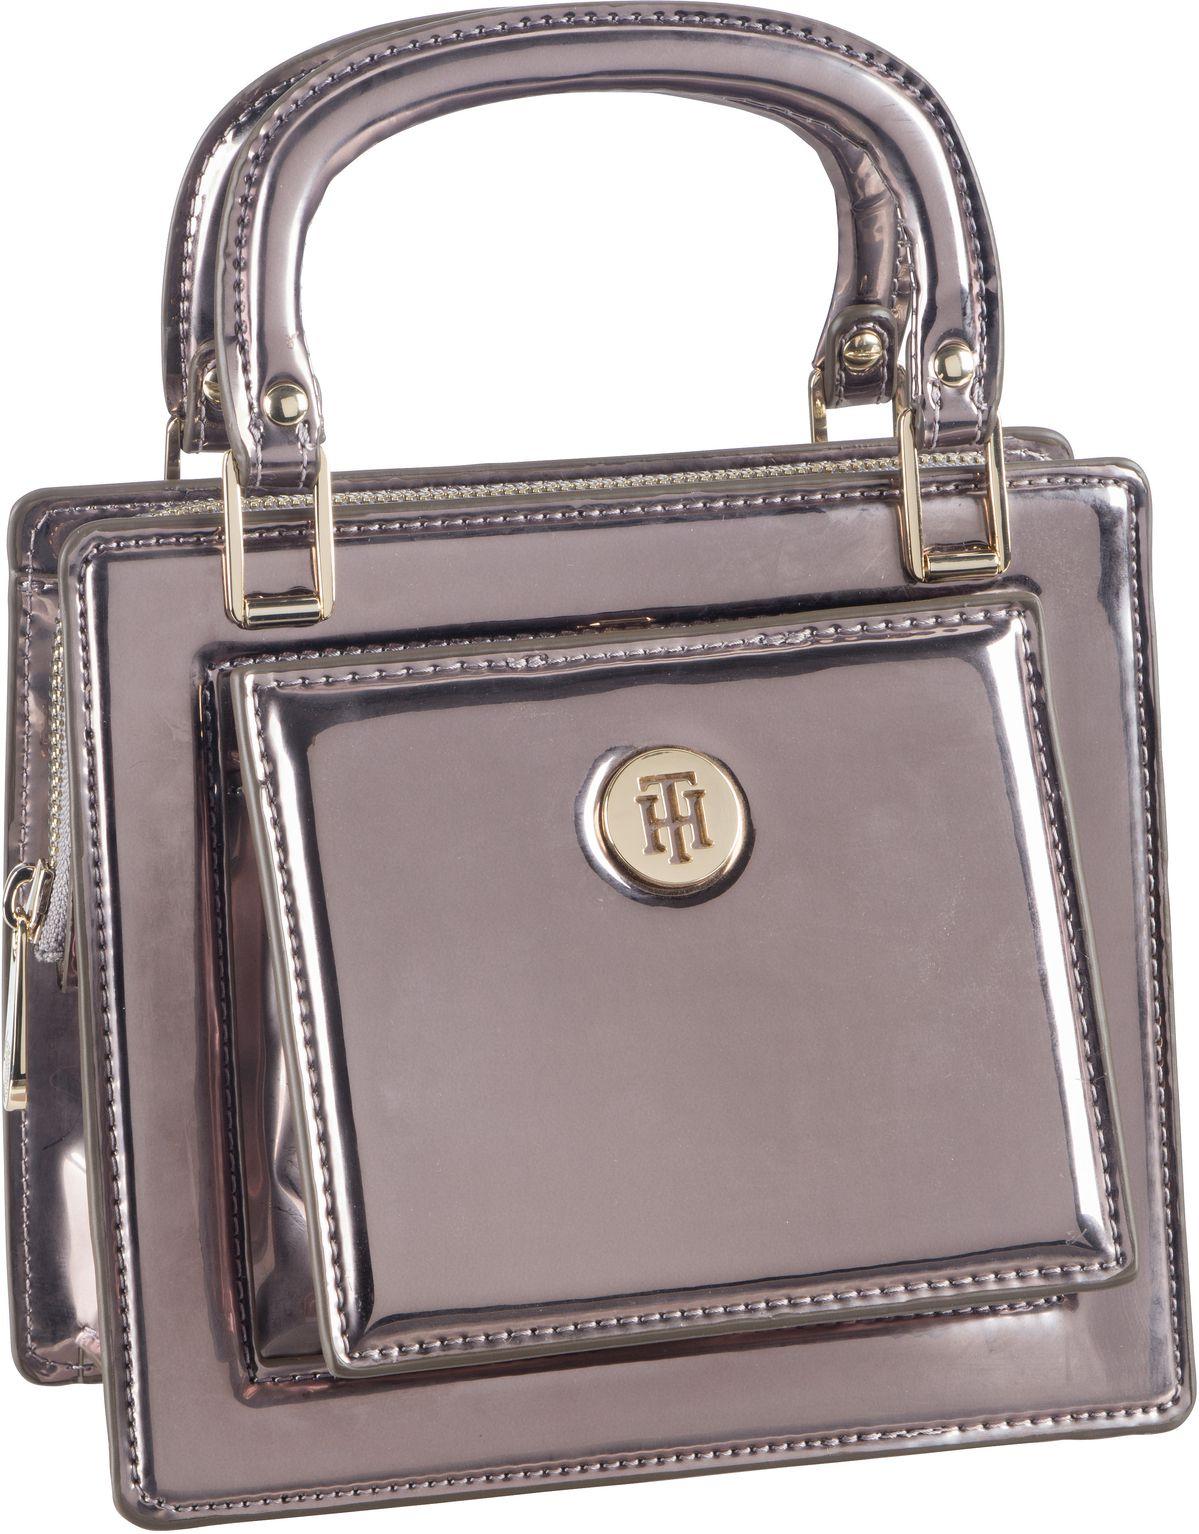 Handtasche TH Fashion Crossover PSP20 Black Silver